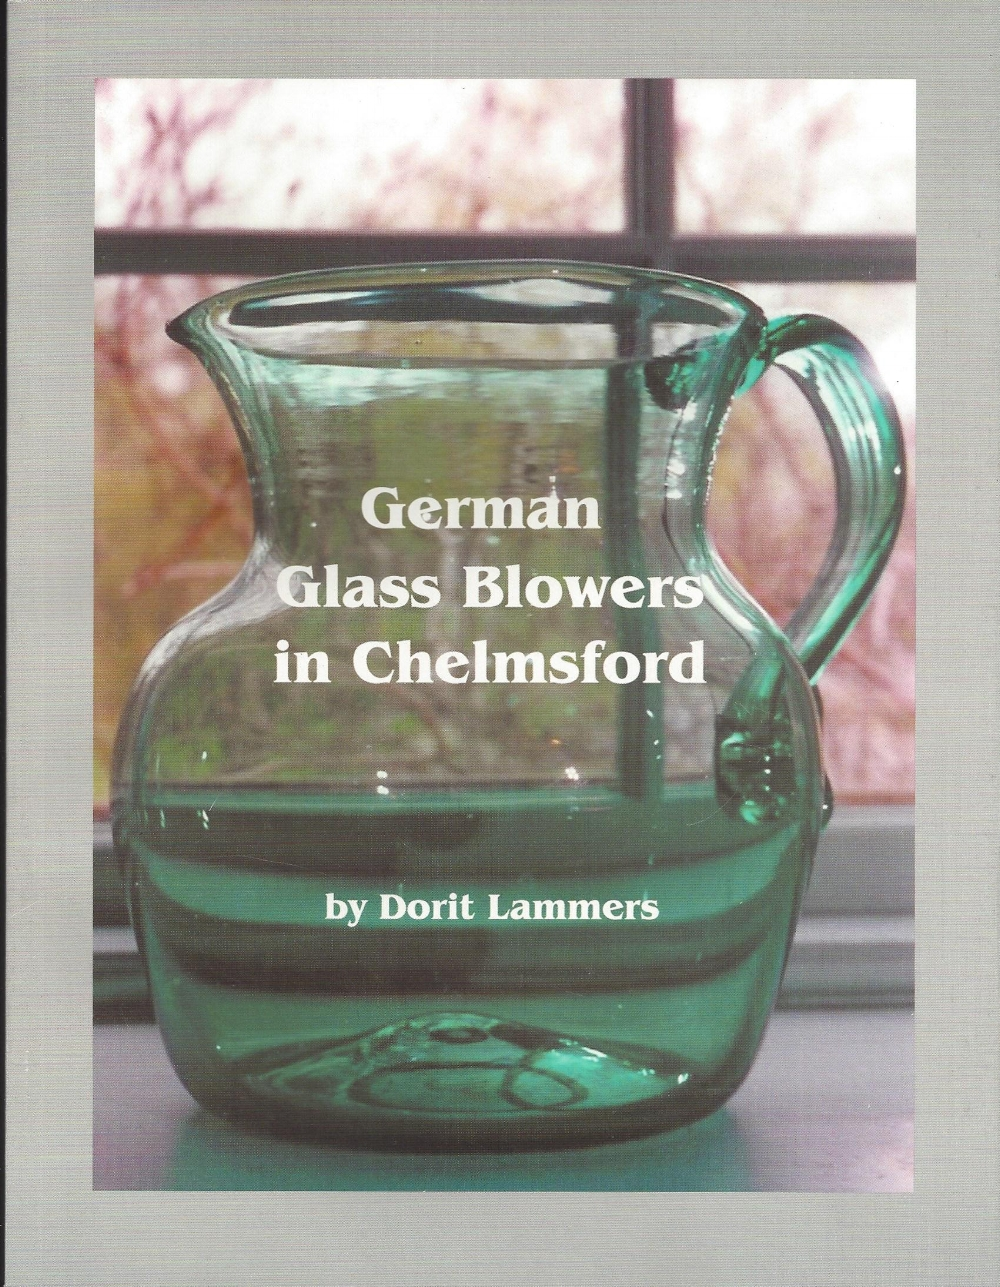 German Glass Blowers in Chelmsford (Book), Lammers $20